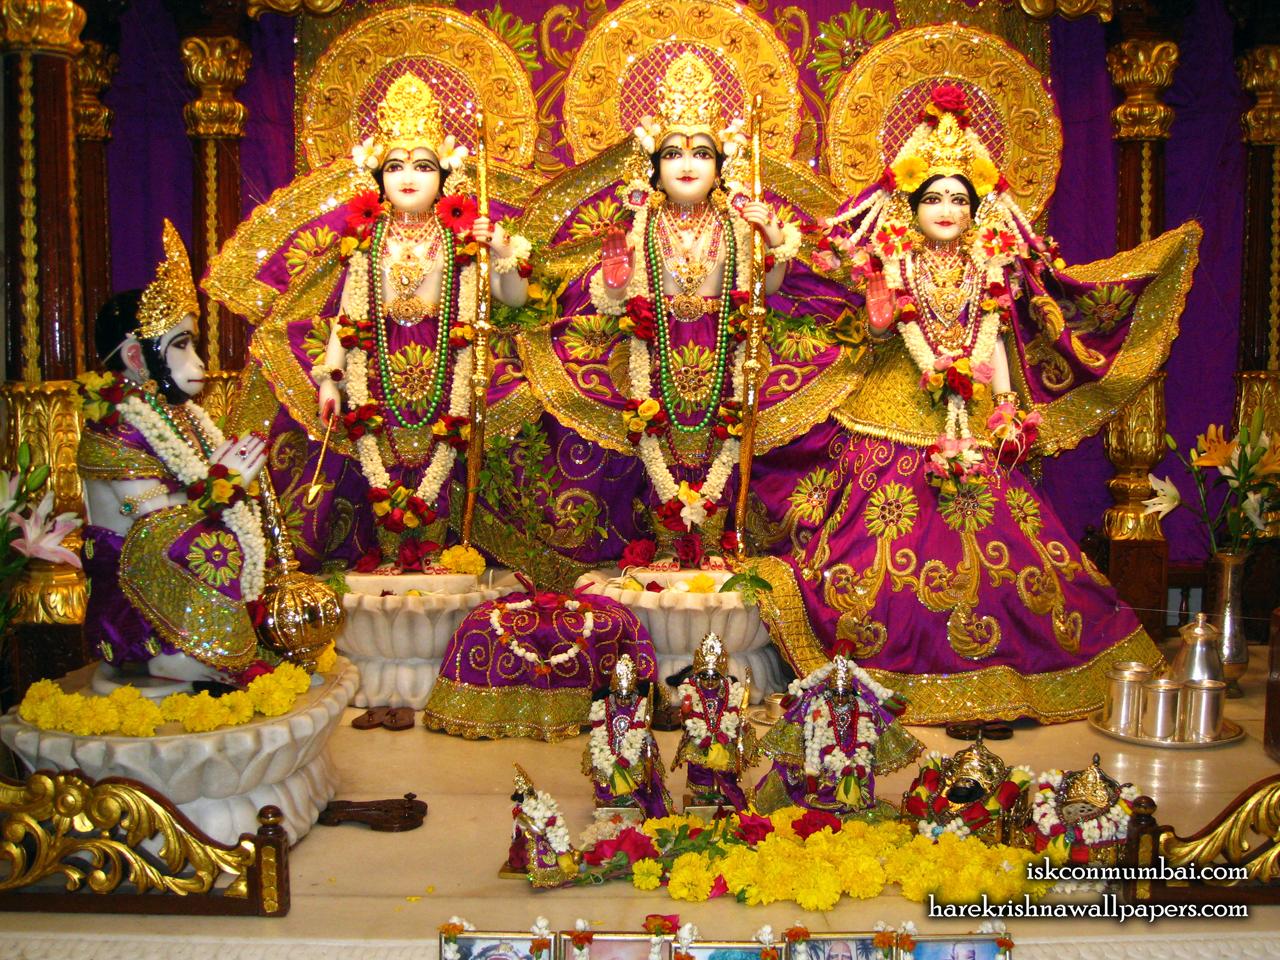 Sri Sri Sita Rama Laxman Hanuman Wallpaper (010) Size 1280x960 Download